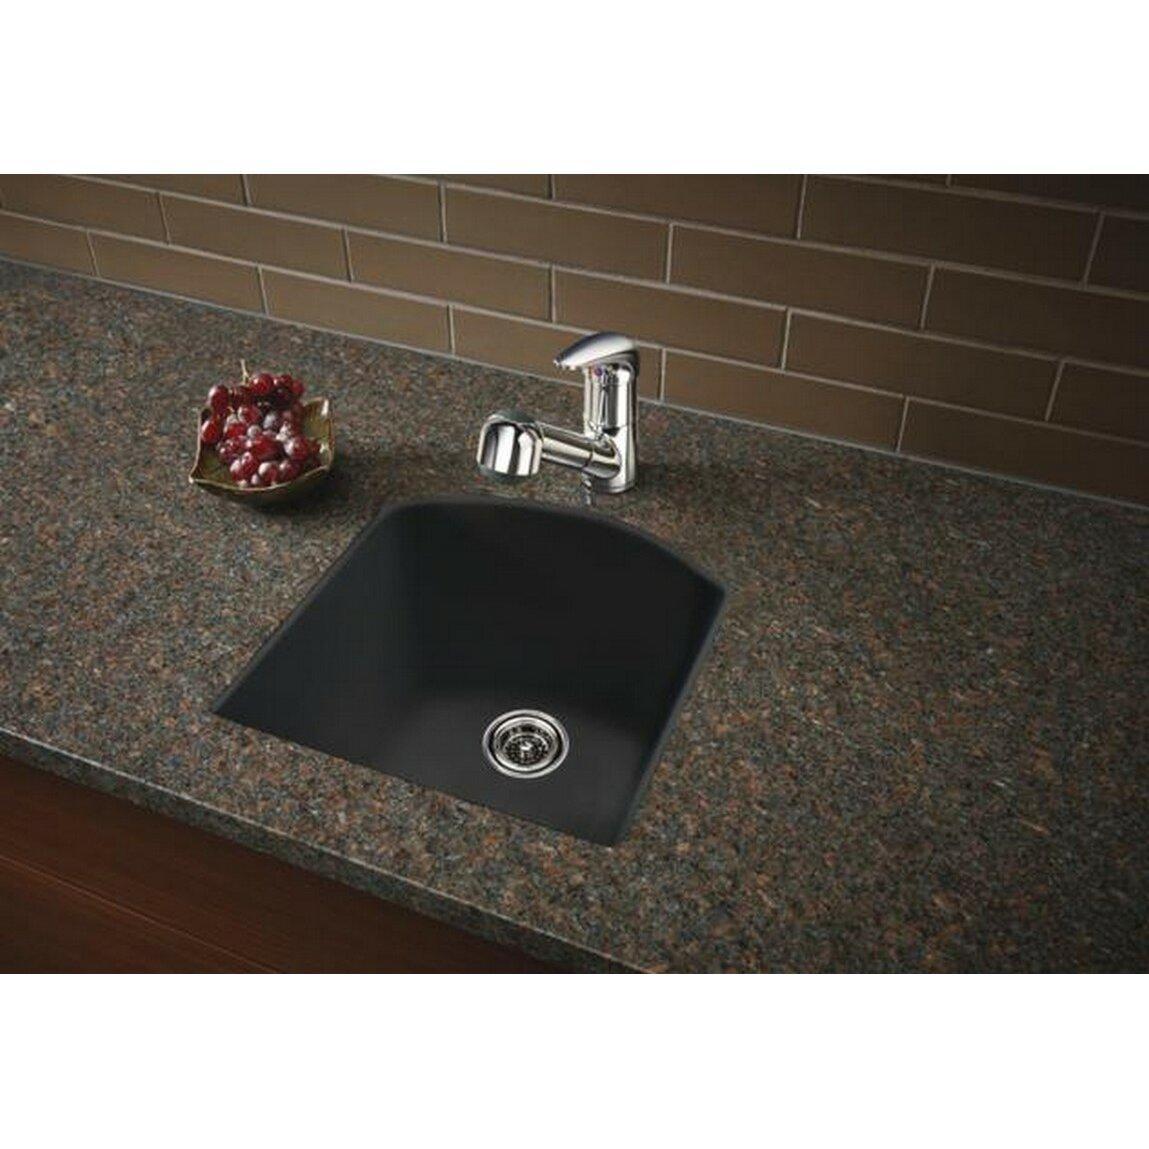 Blanco Granite Kitchen Sinks Blanco Diamond 15 X 15 Drop In Kitchen Sink Reviews Wayfair